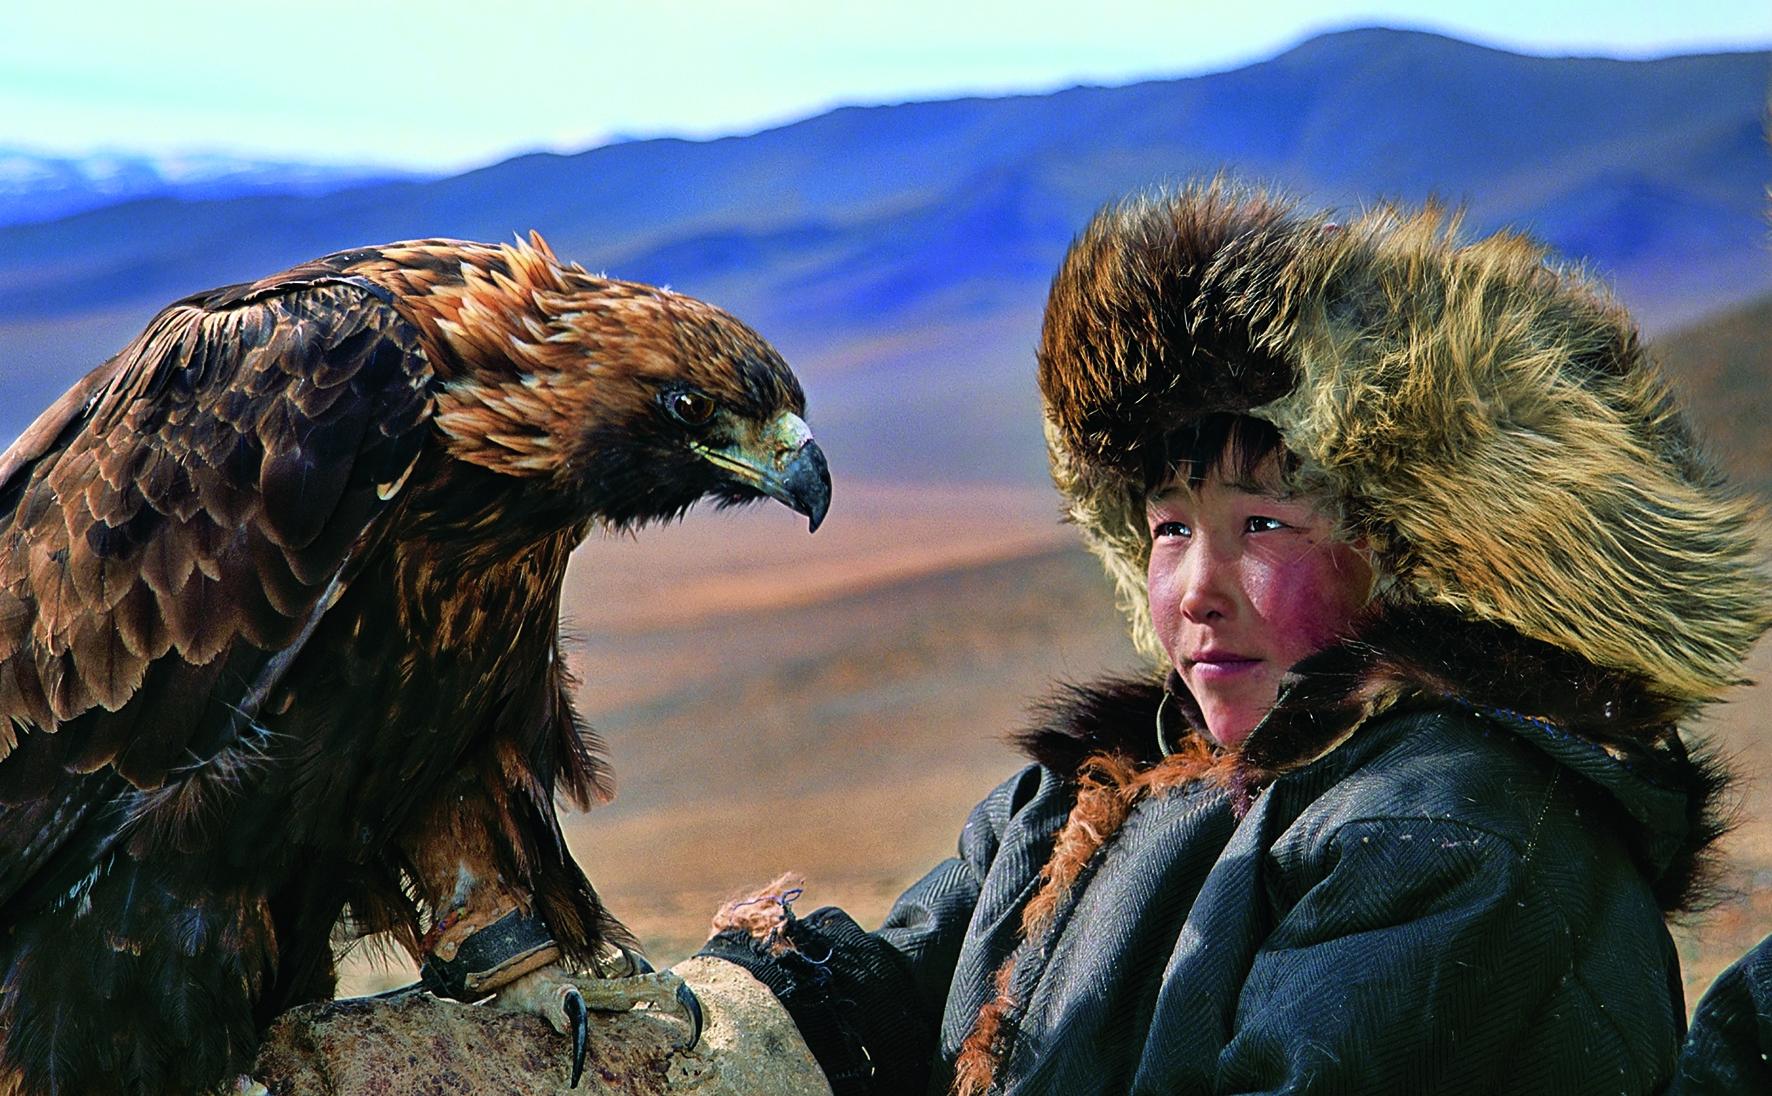 Balapan, Deloun Highlands, Olgii Province, Mongolia, 2001   Photo © 2016 Hamid Sardar. All rights reserved.  www.hamidsardarphoto.com